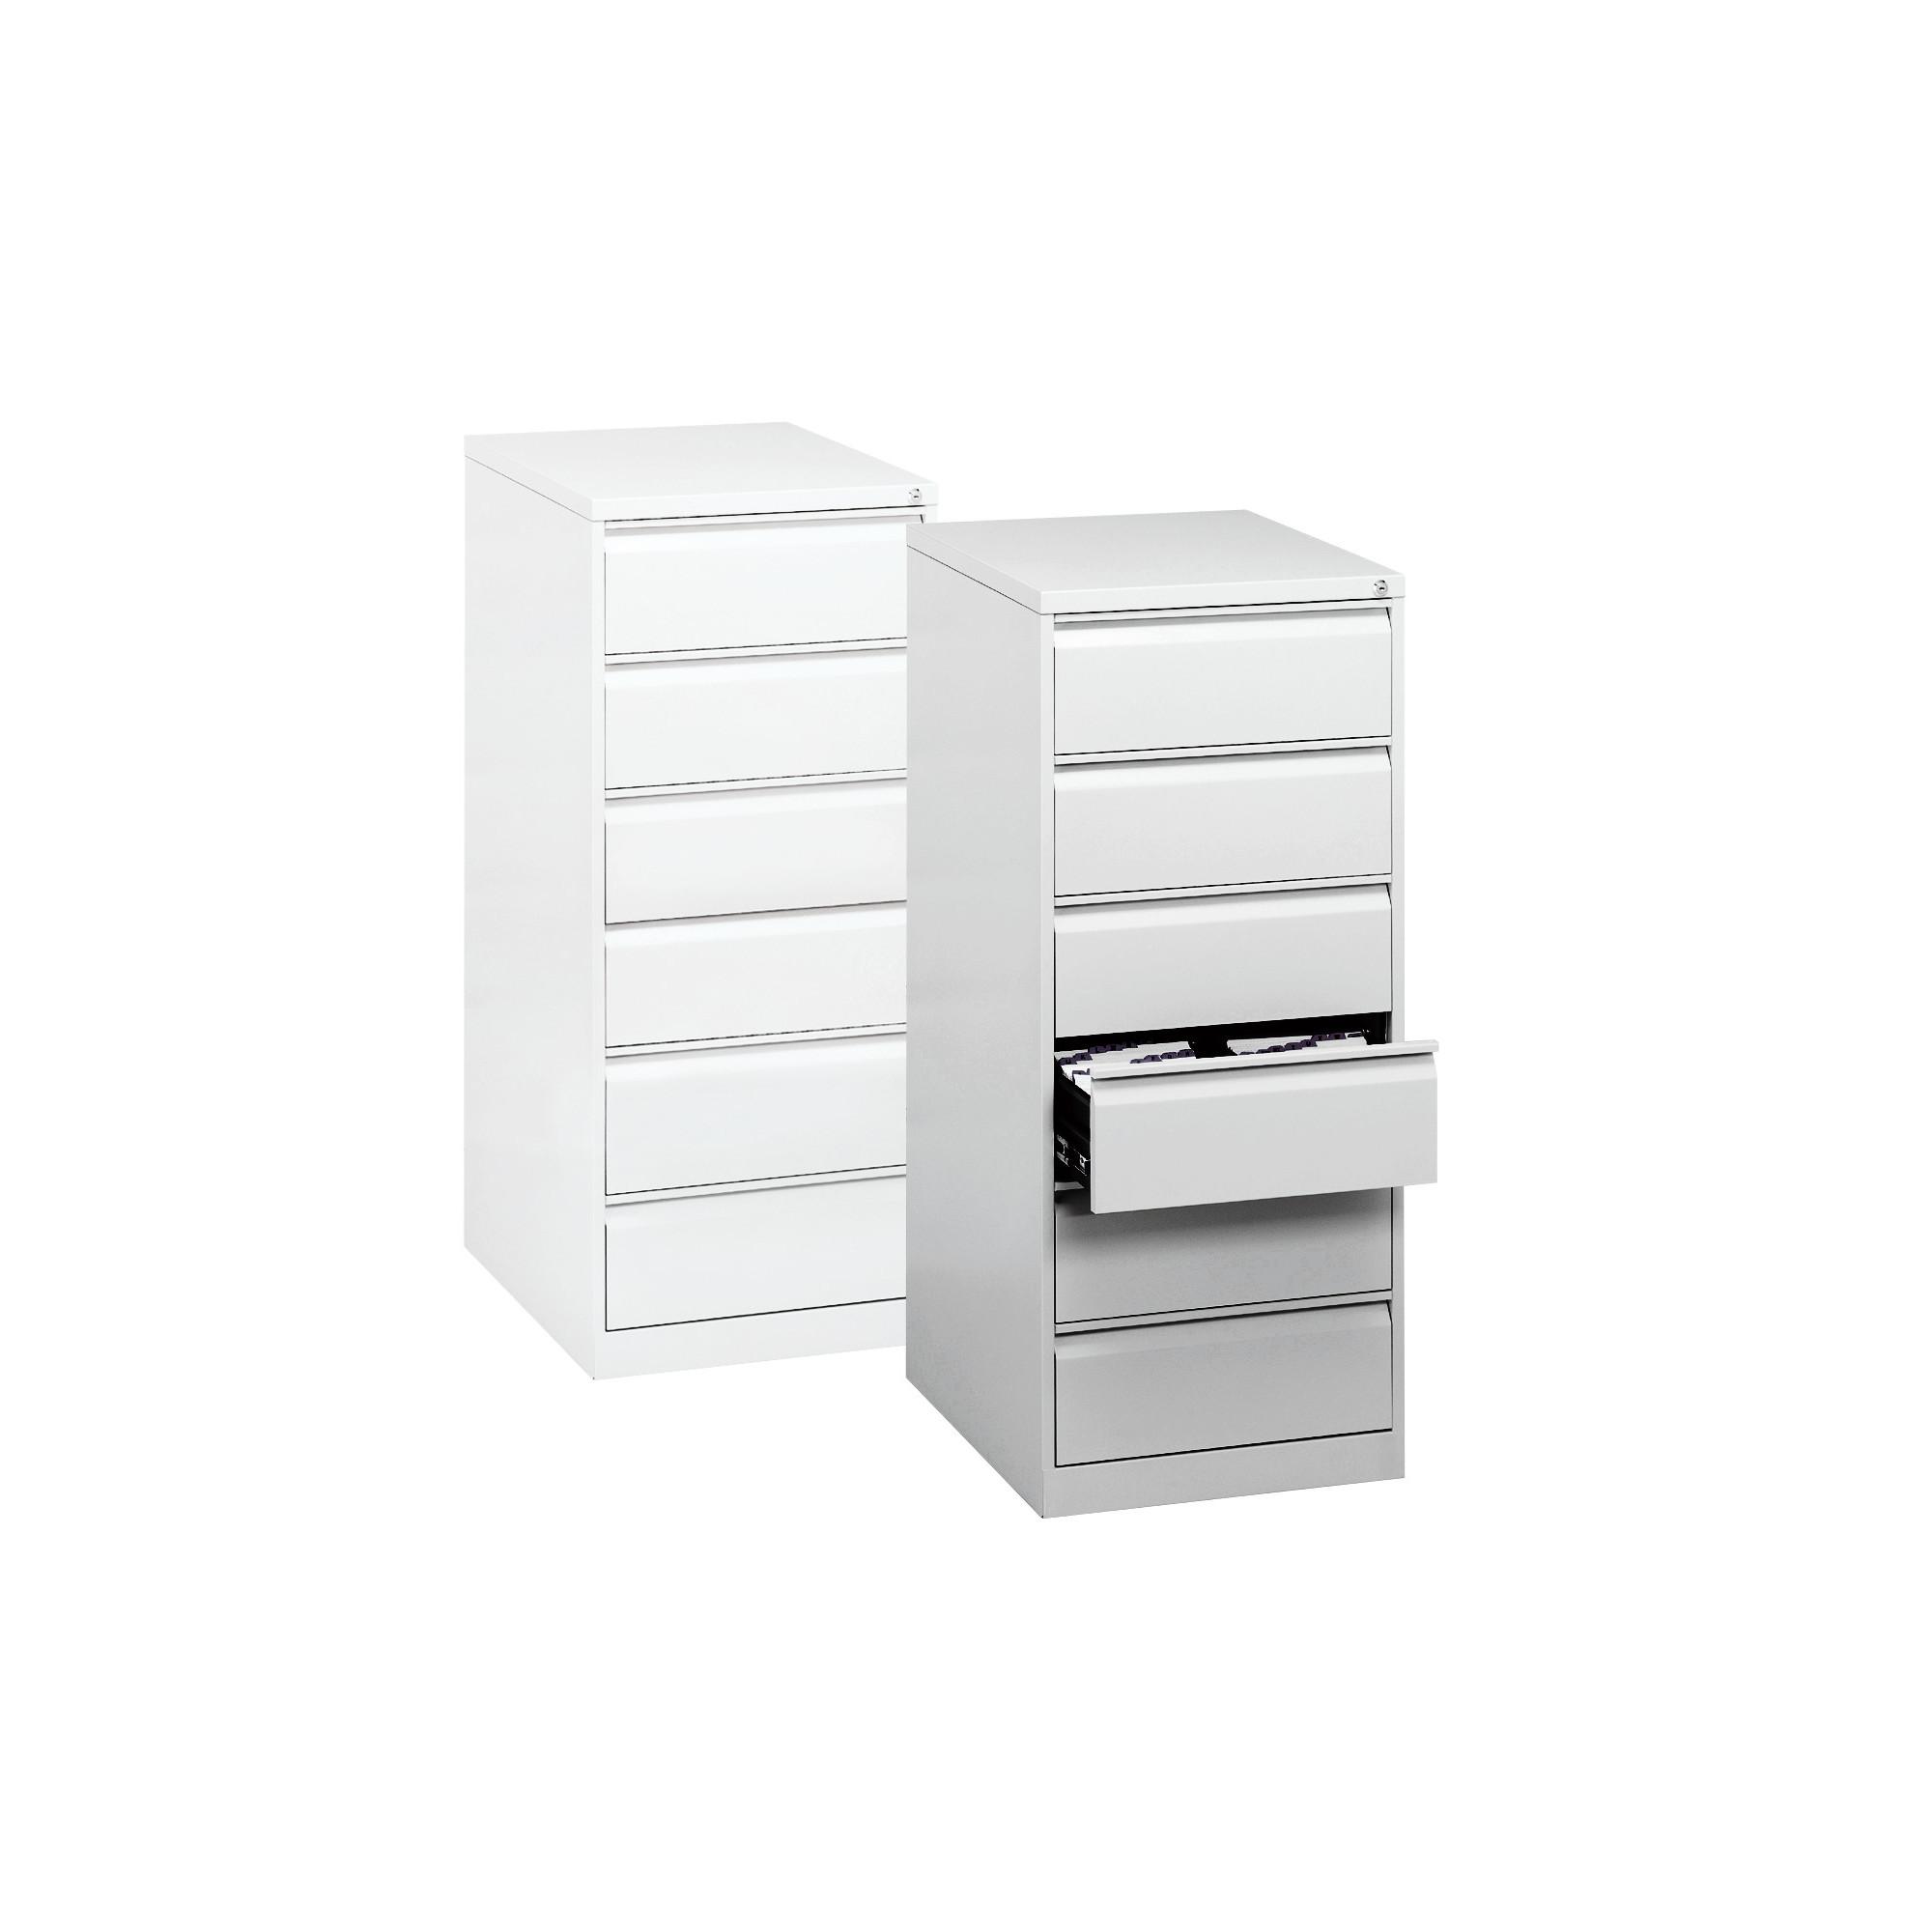 Armoir métallique à tiroir - Acier - Blanc pur - Ruck